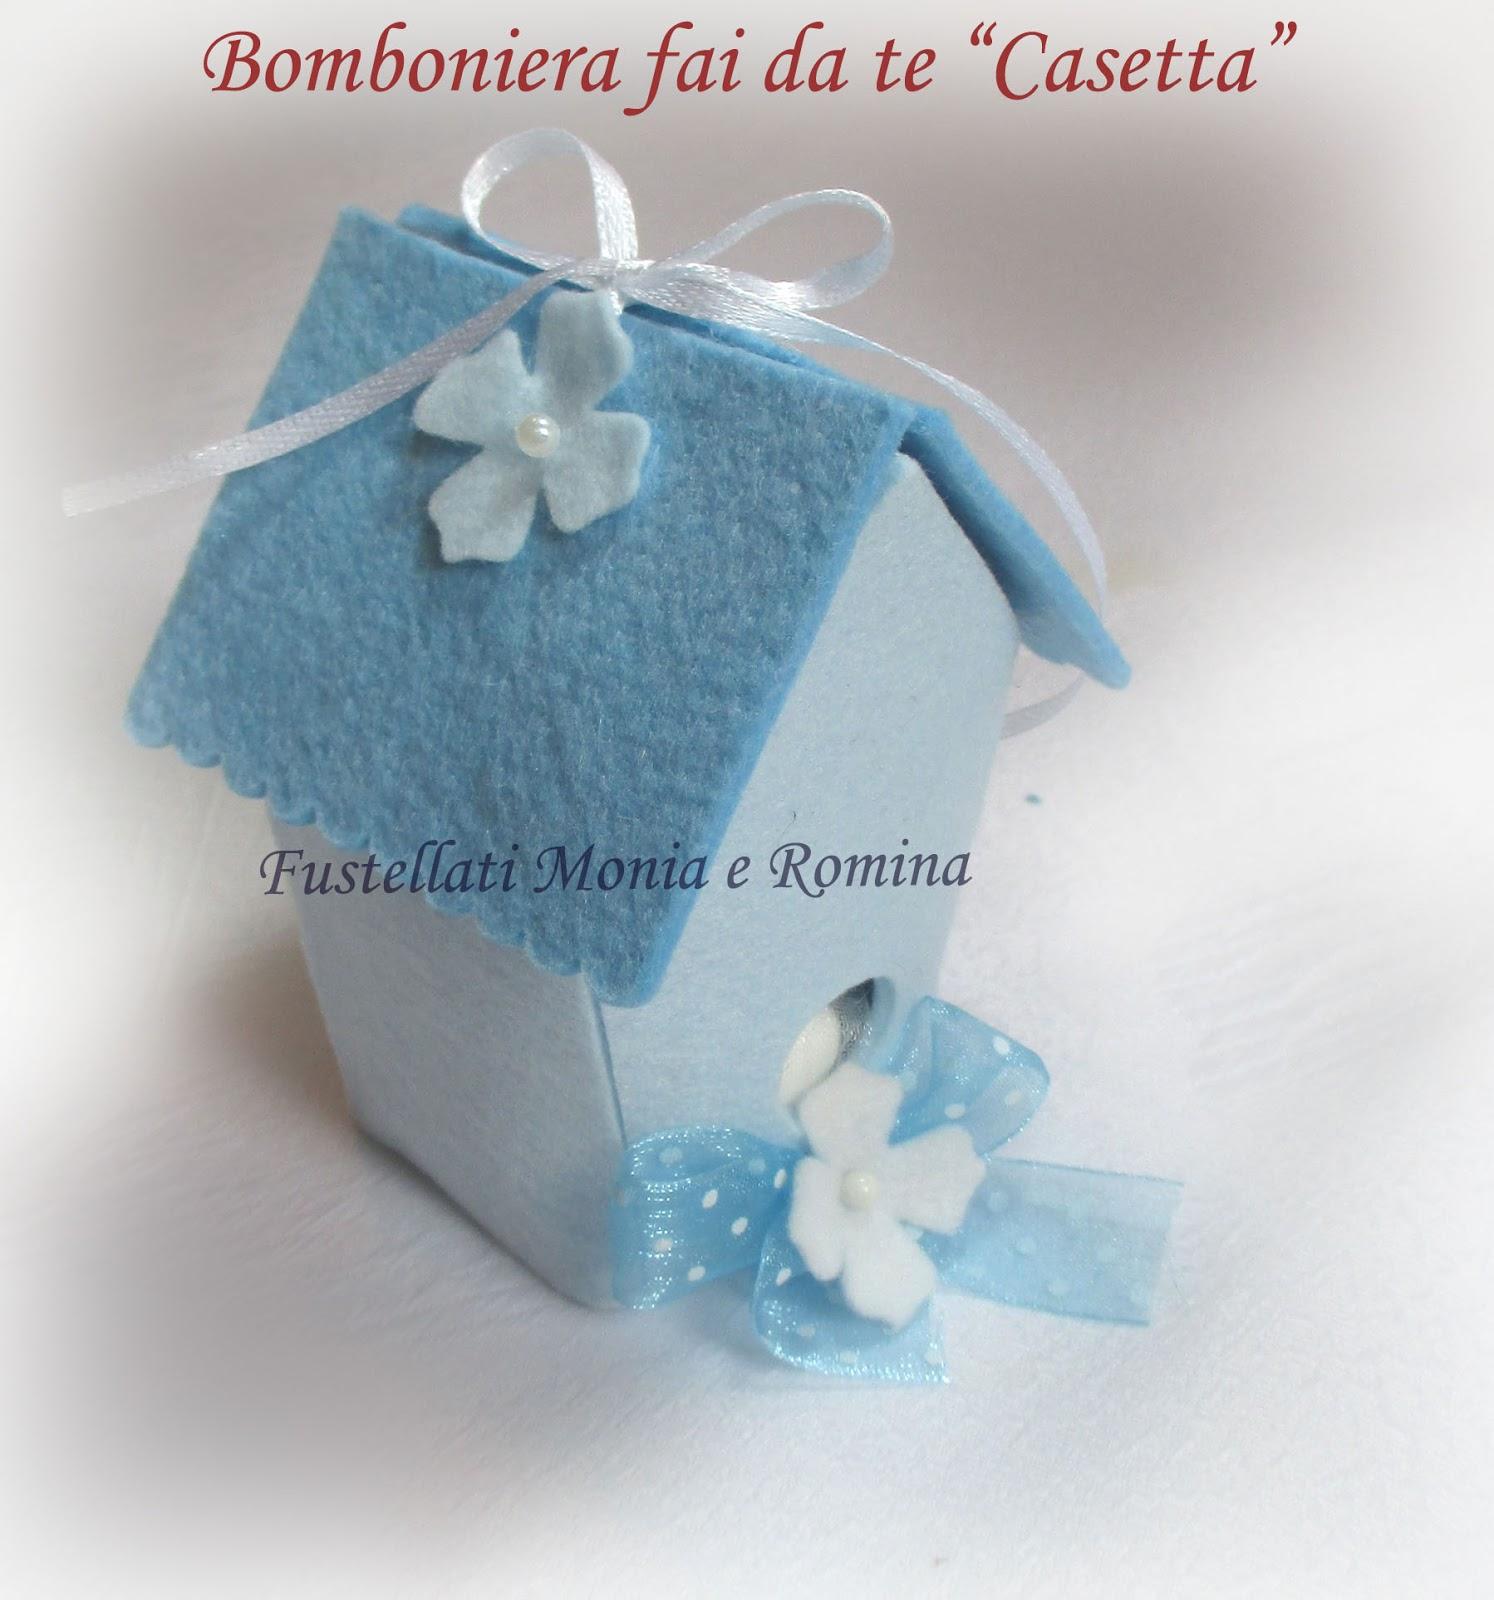 Bomboniere battesimo fai da te originali lz73 regardsdefemmes - Decorazioni battesimo fai da te ...